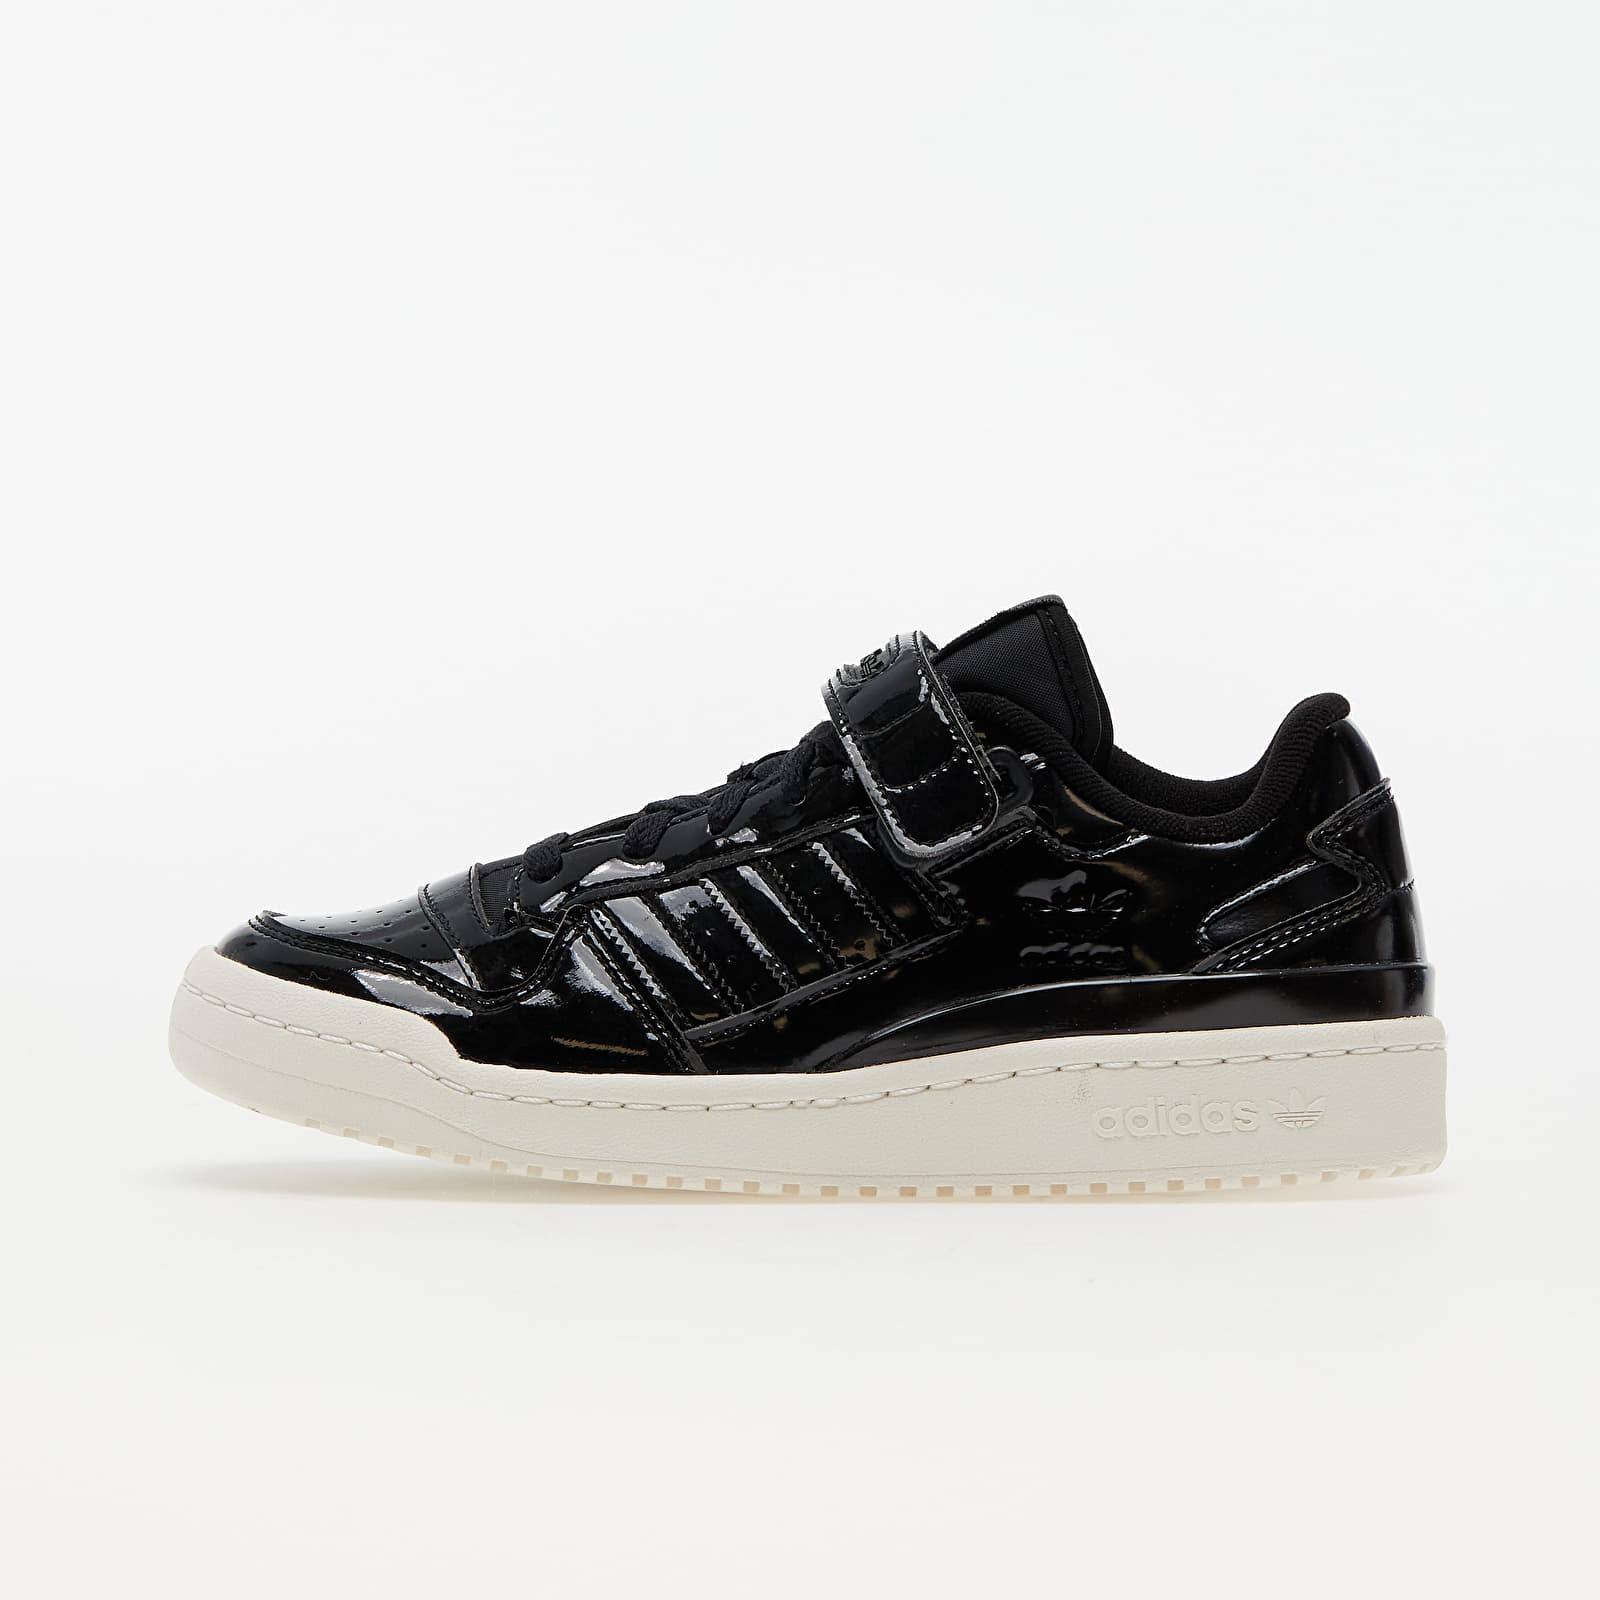 adidas Forum Low W Core Black/ Core Black/ Off White G58030